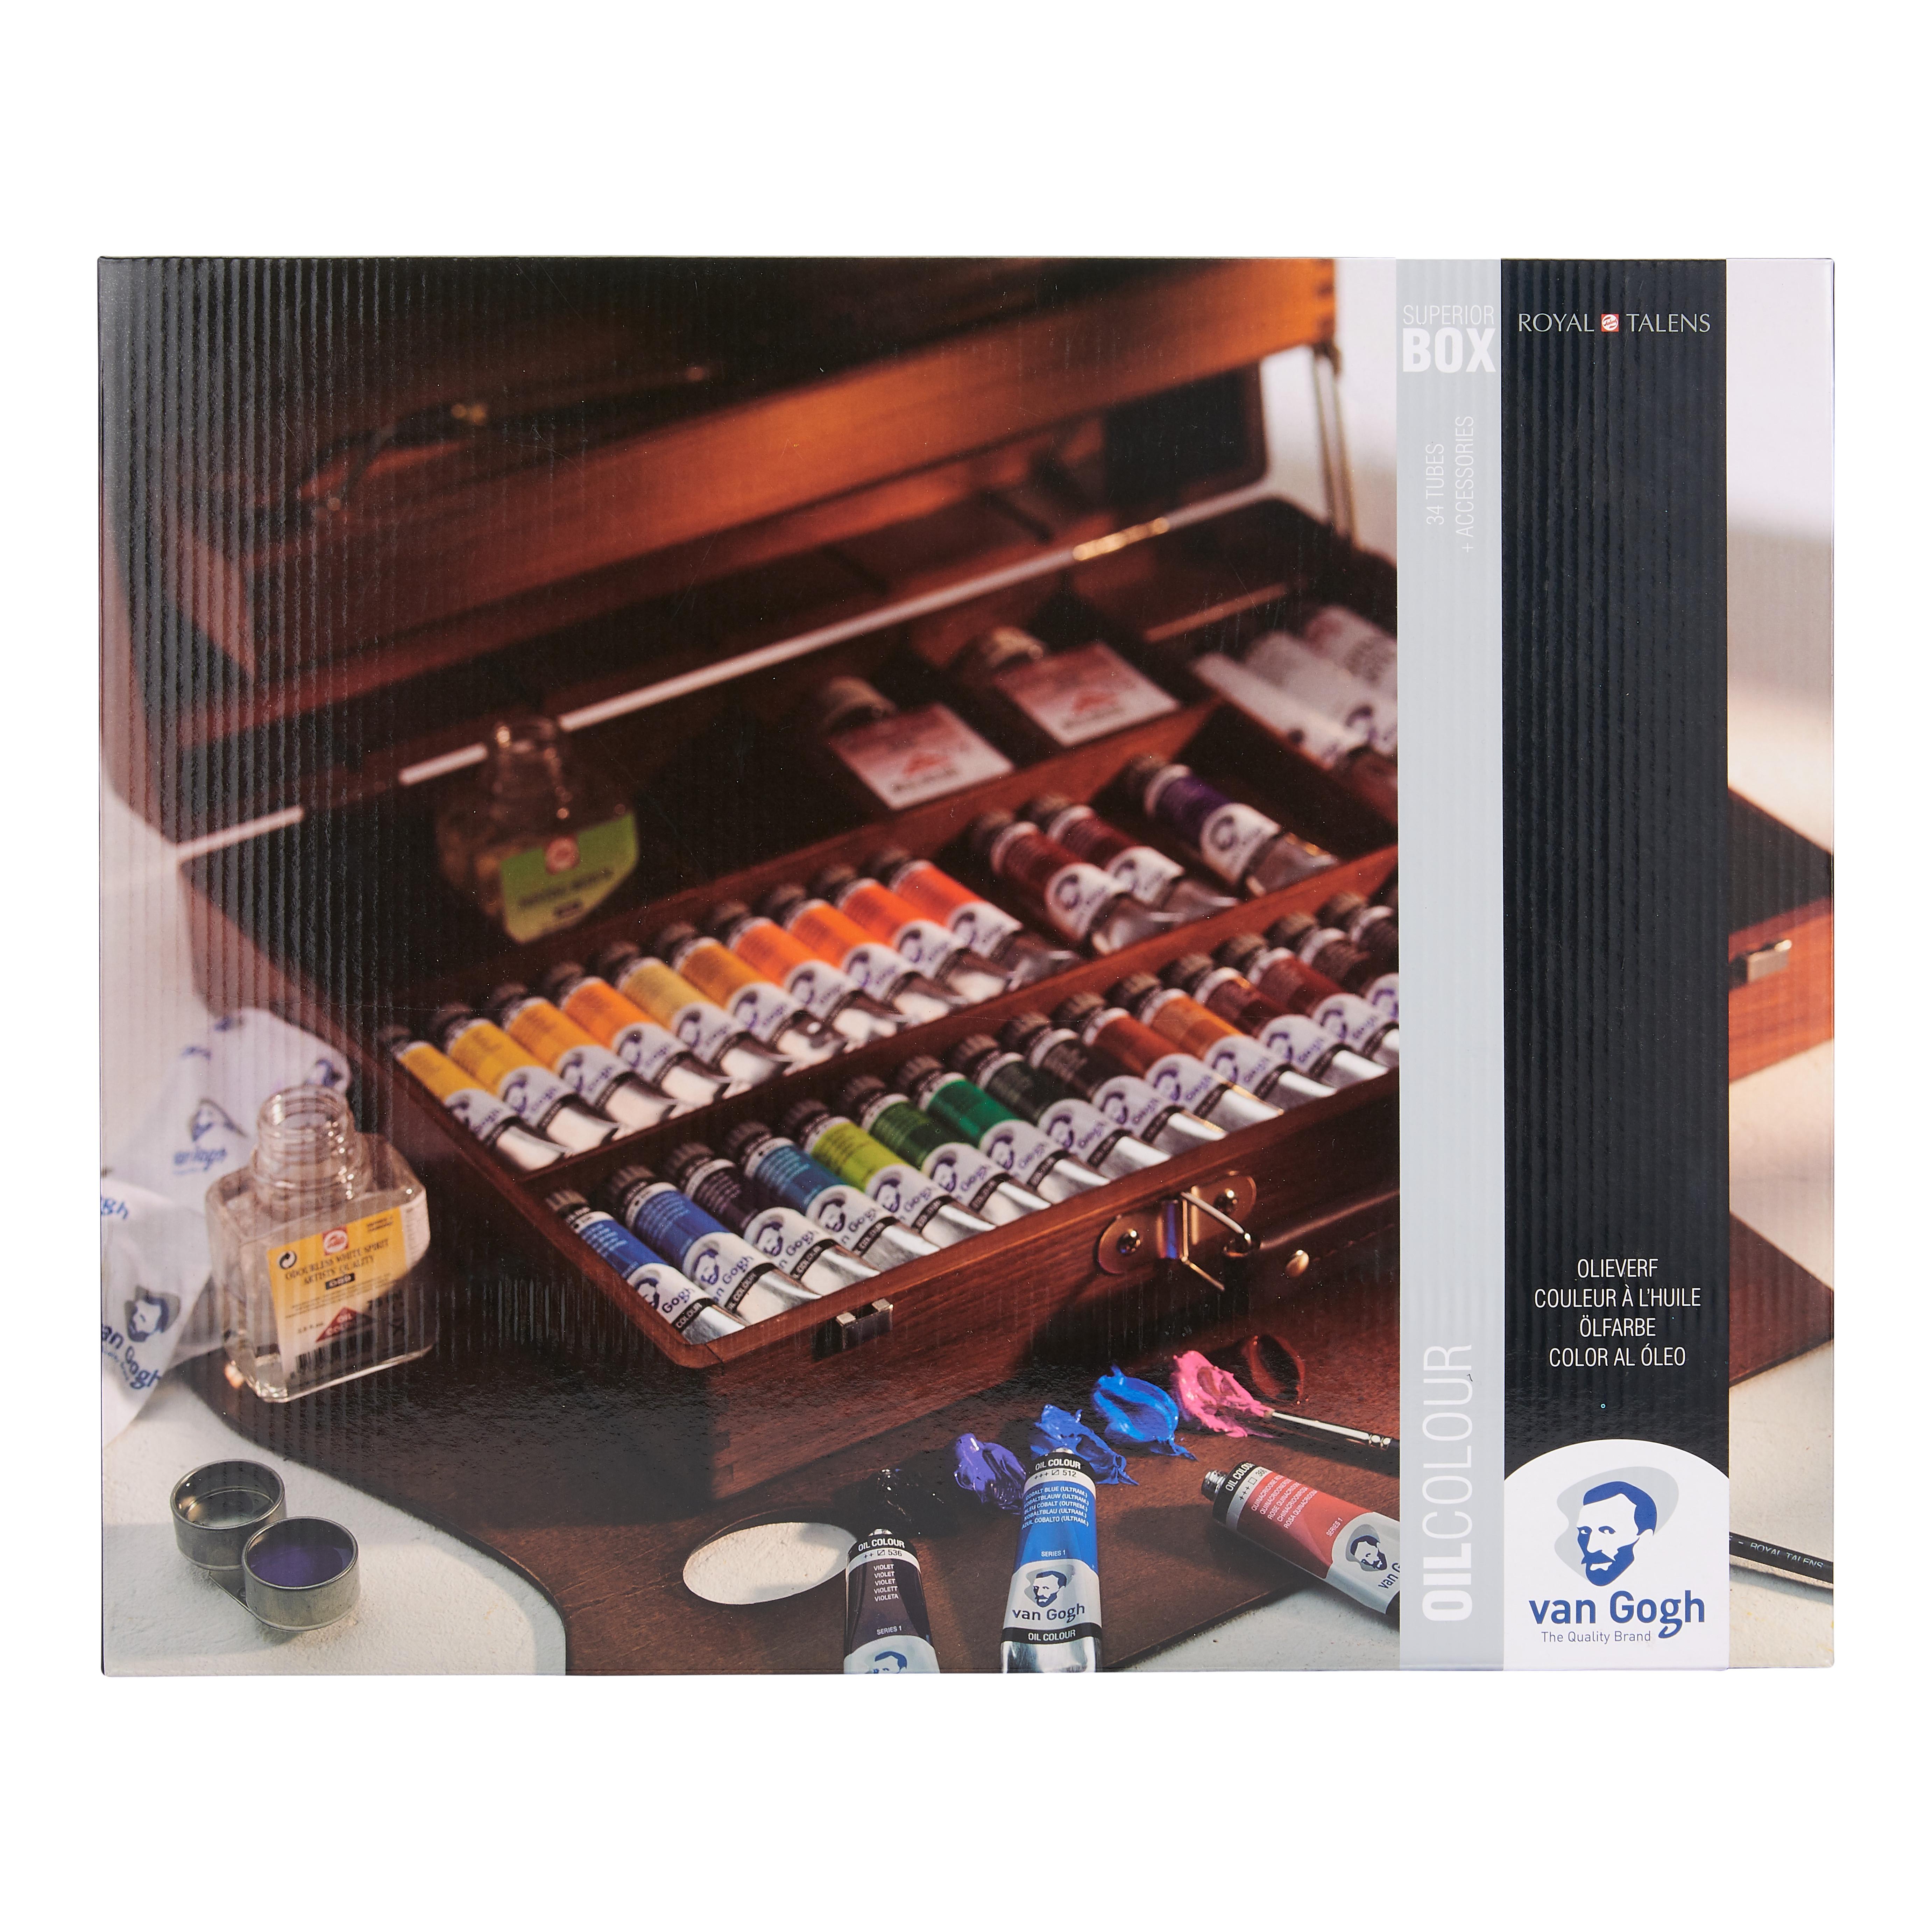 Van Gogh Oil Colour Wooden Box Set Superior with 32 Colours in 20ml Tube and 2 colours in 60ml Tube + Accessories